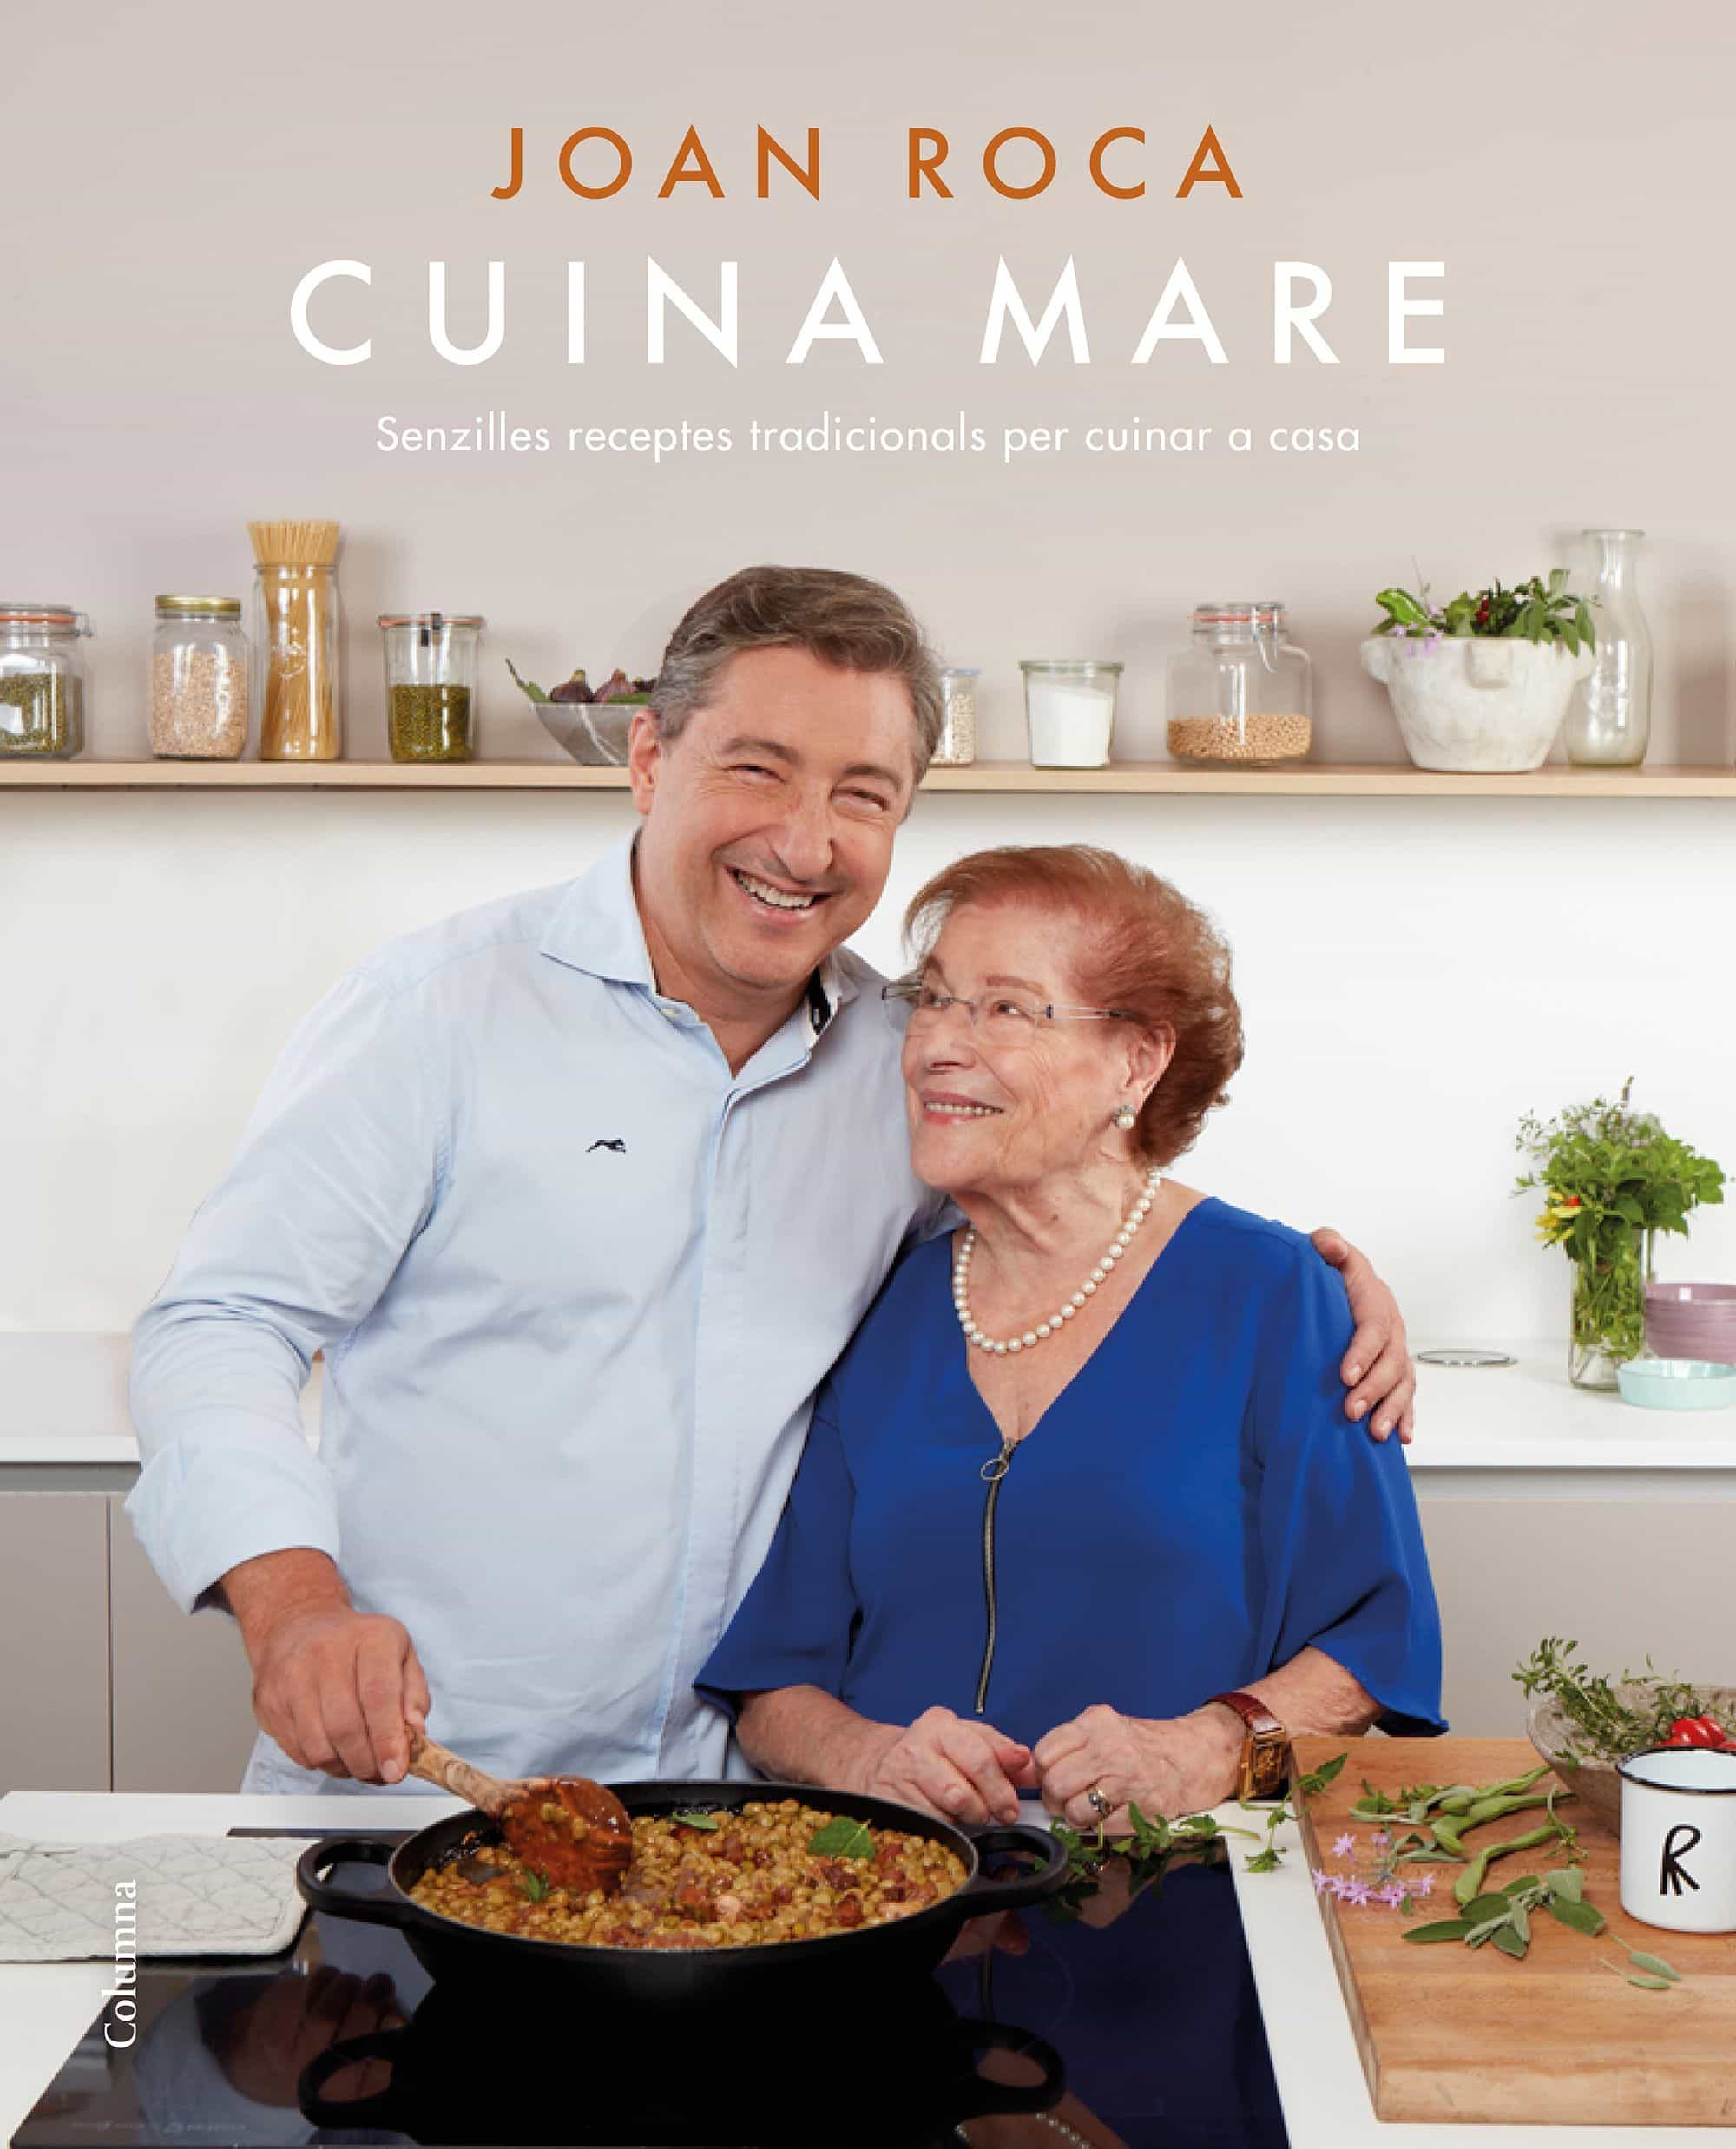 cuina mare-joan roca-9788466424844